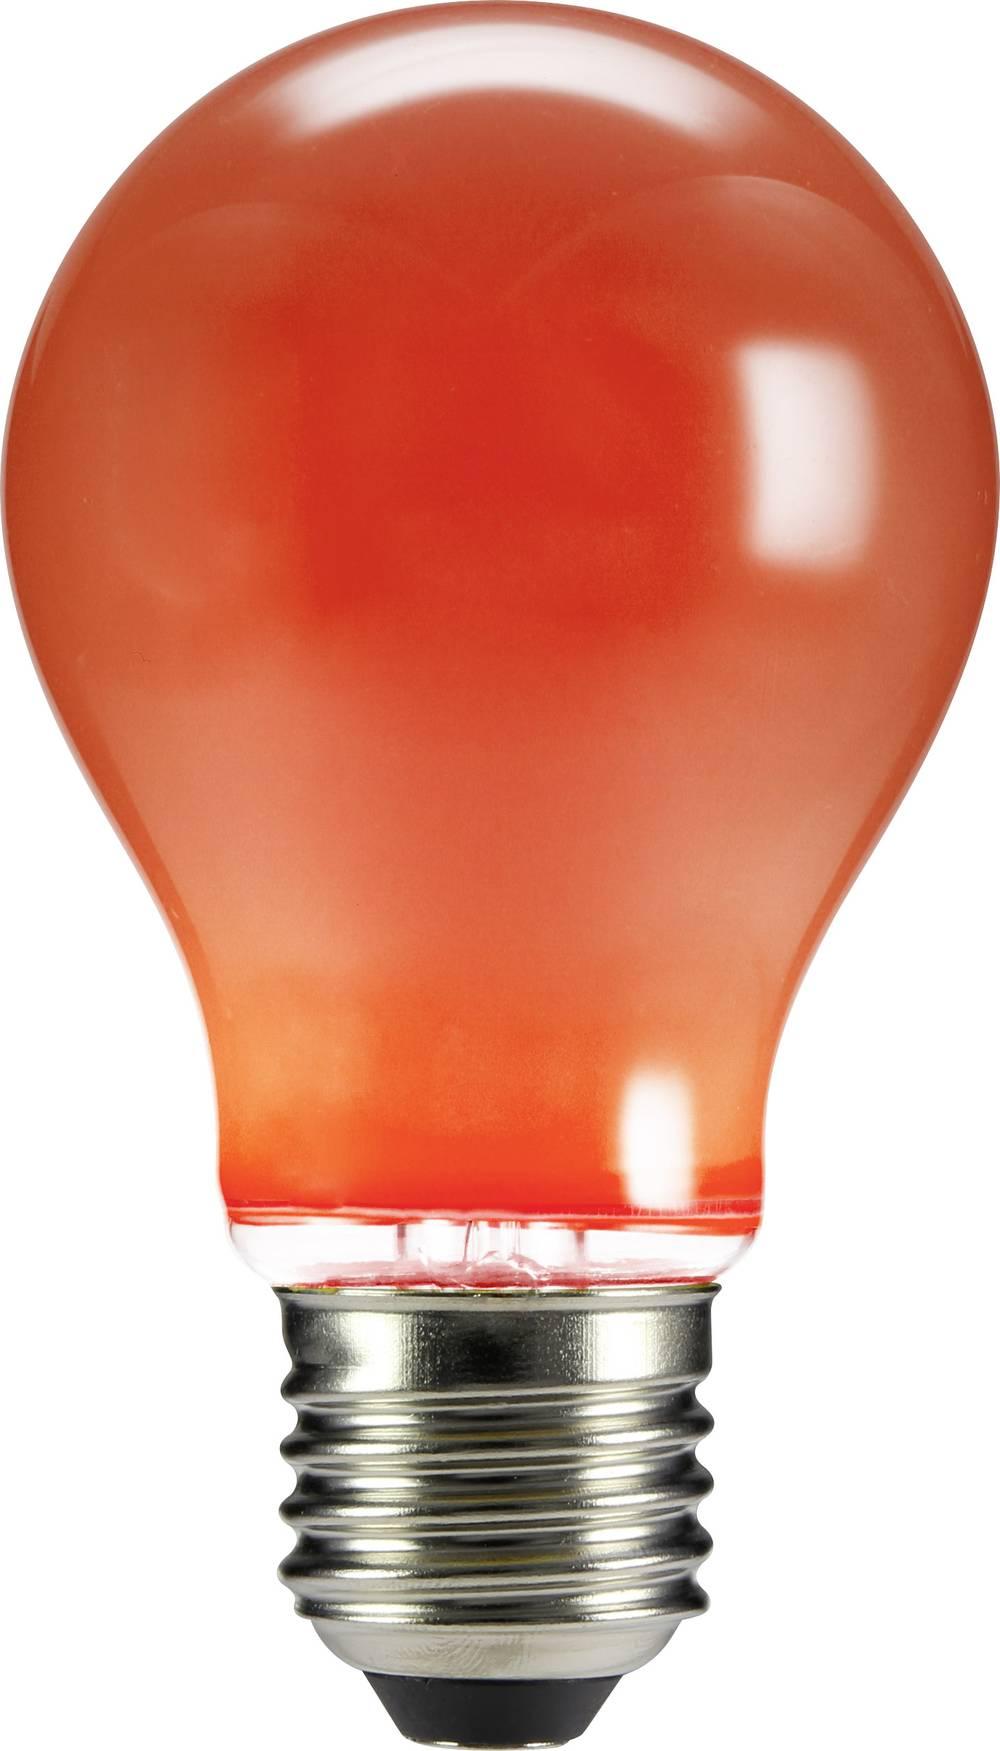 LED žarnica E27 klasična oblika 4 W rdeča (premer x D) 60 mm x 105 mm EEK: n.rel. Sygonix filament 1 kos